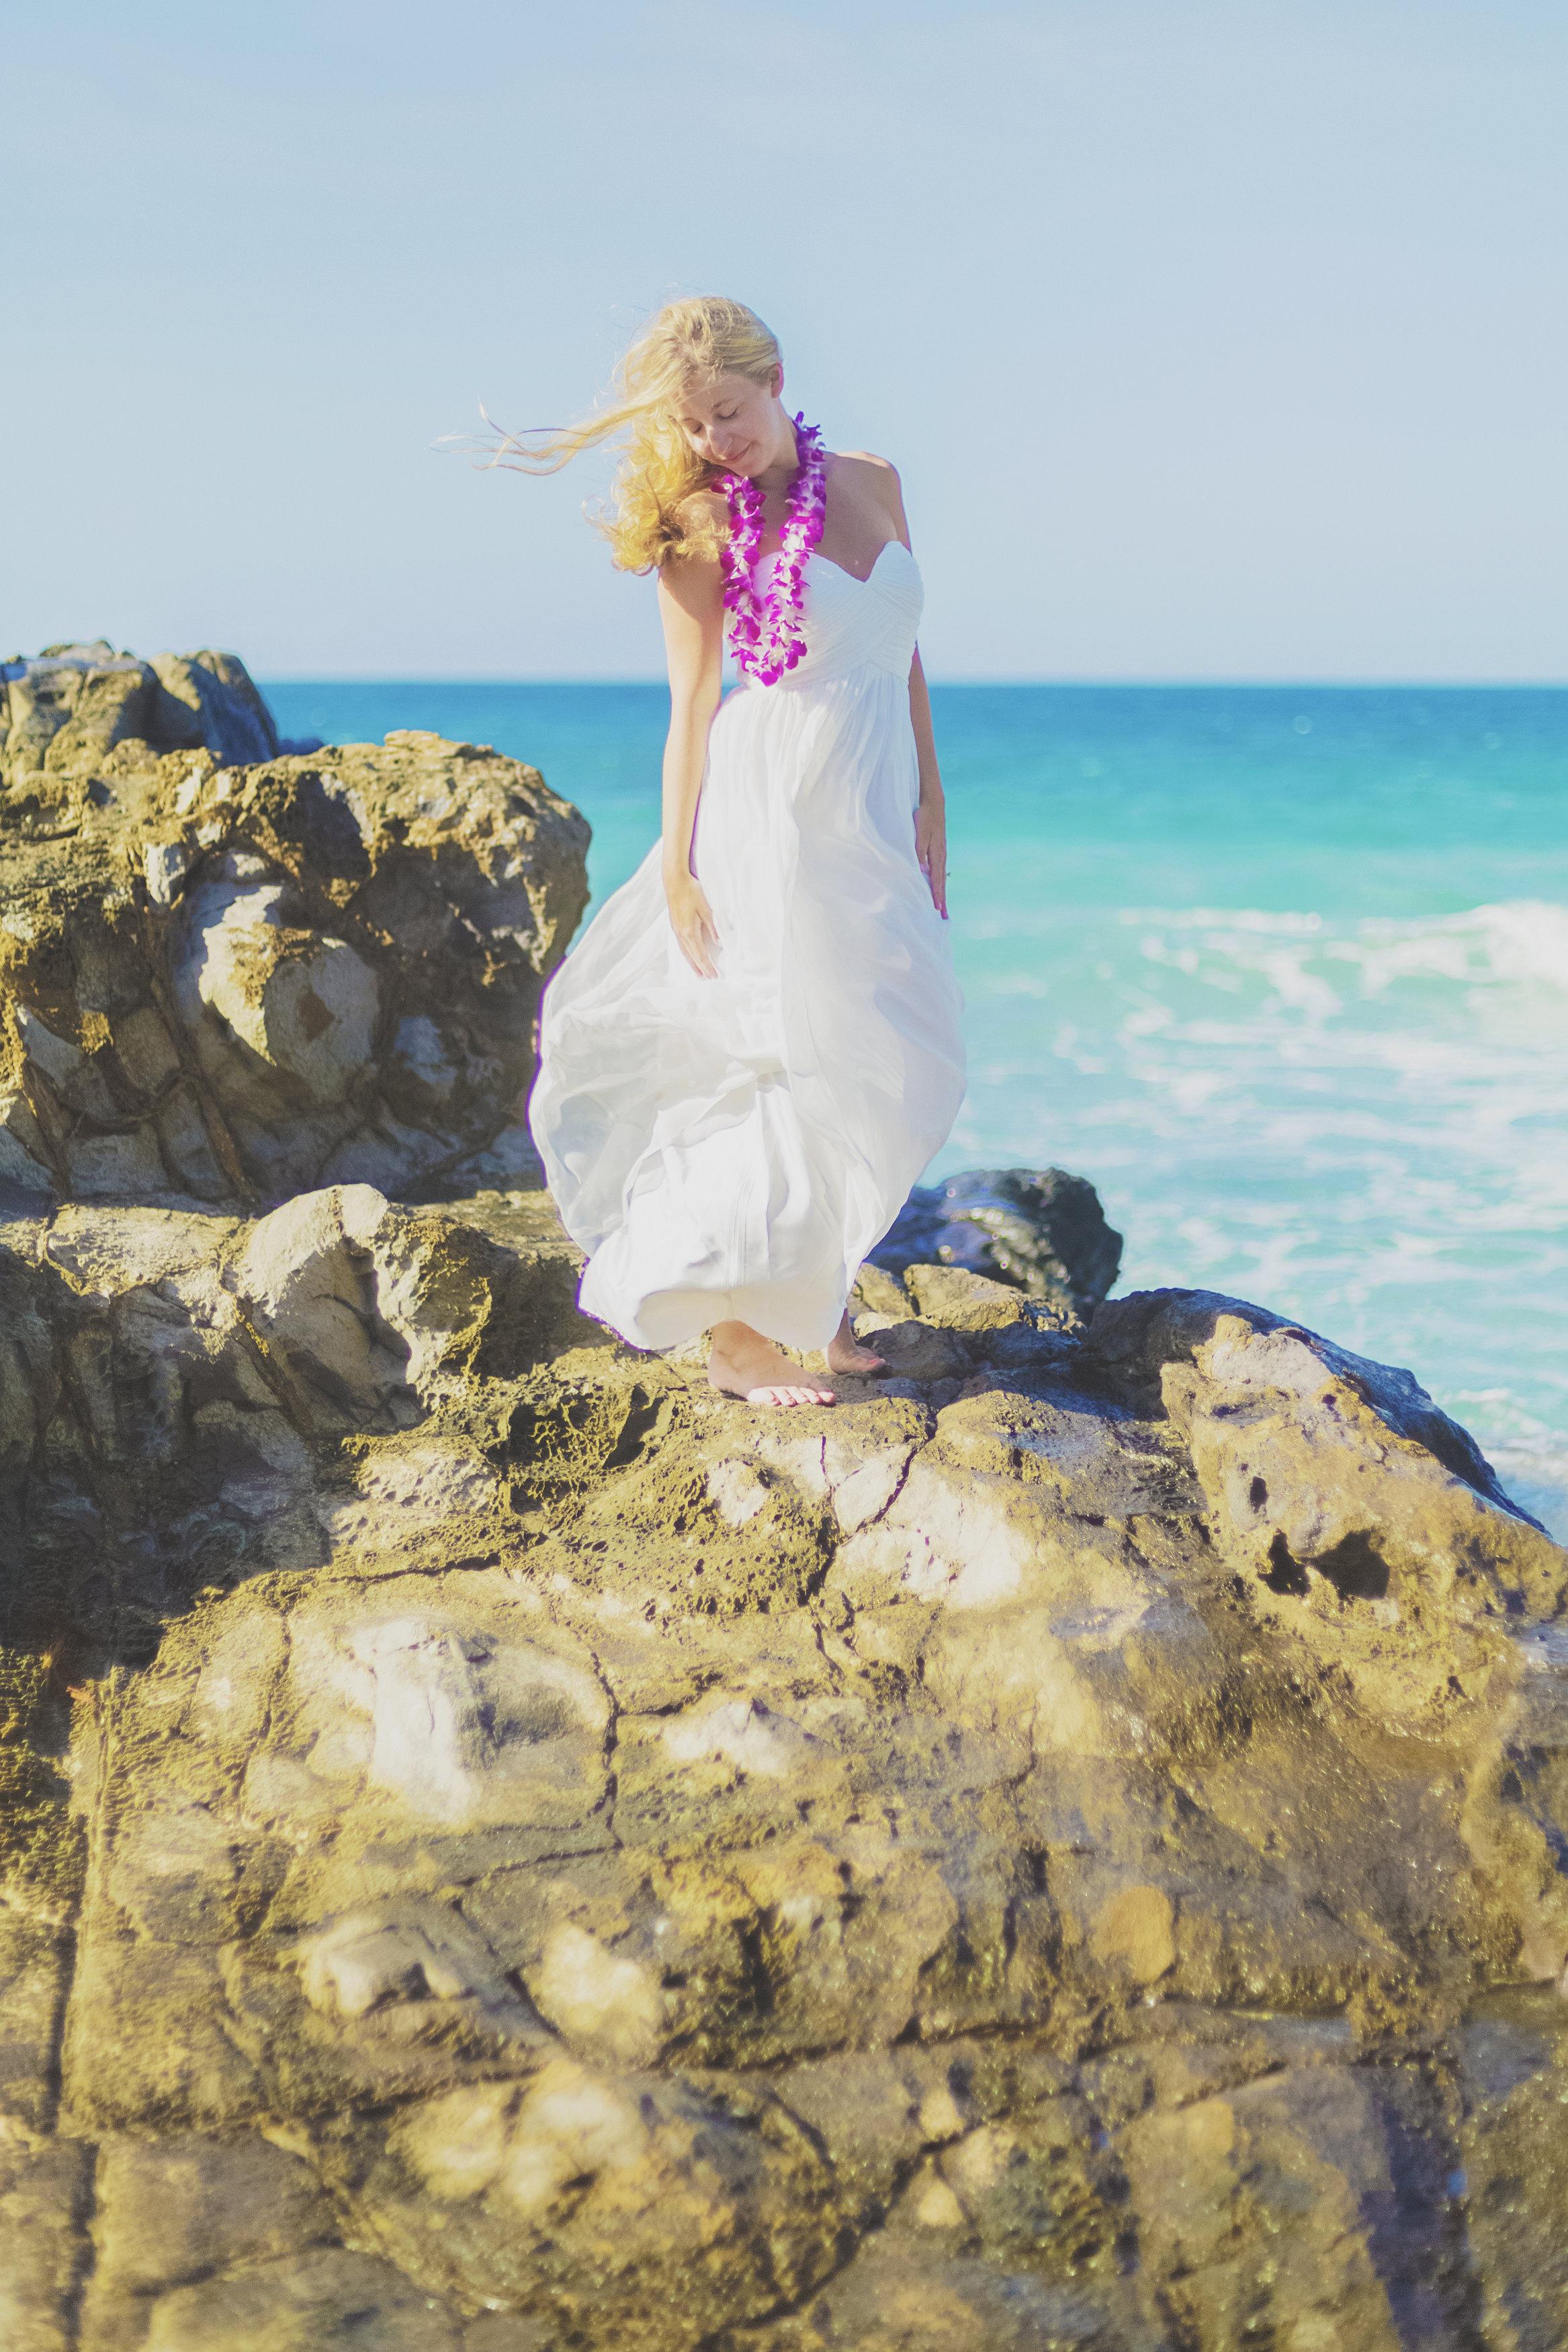 angie-diaz-photography-maui-honeymoon-hawaii-elopement-17.jpg